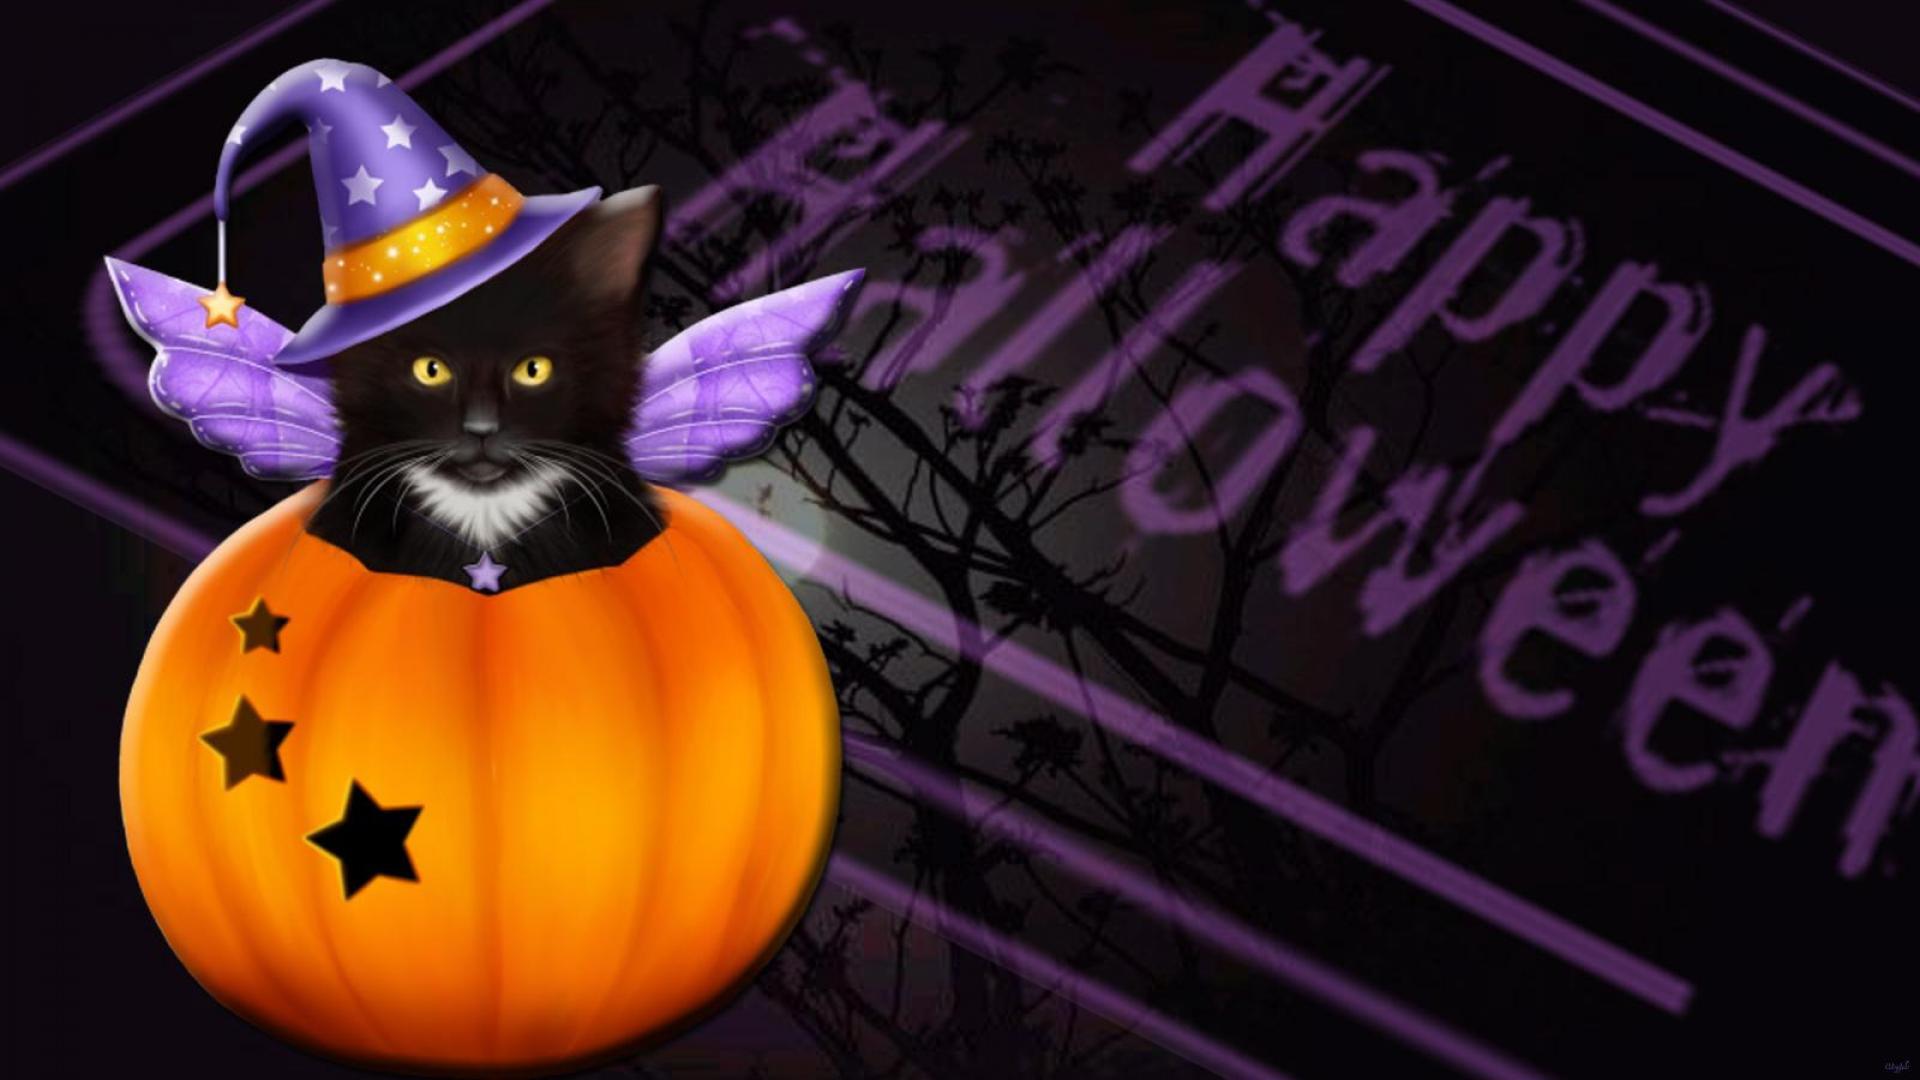 Must see Wallpaper Halloween Kitten - purdYf  Pic_757118.jpg